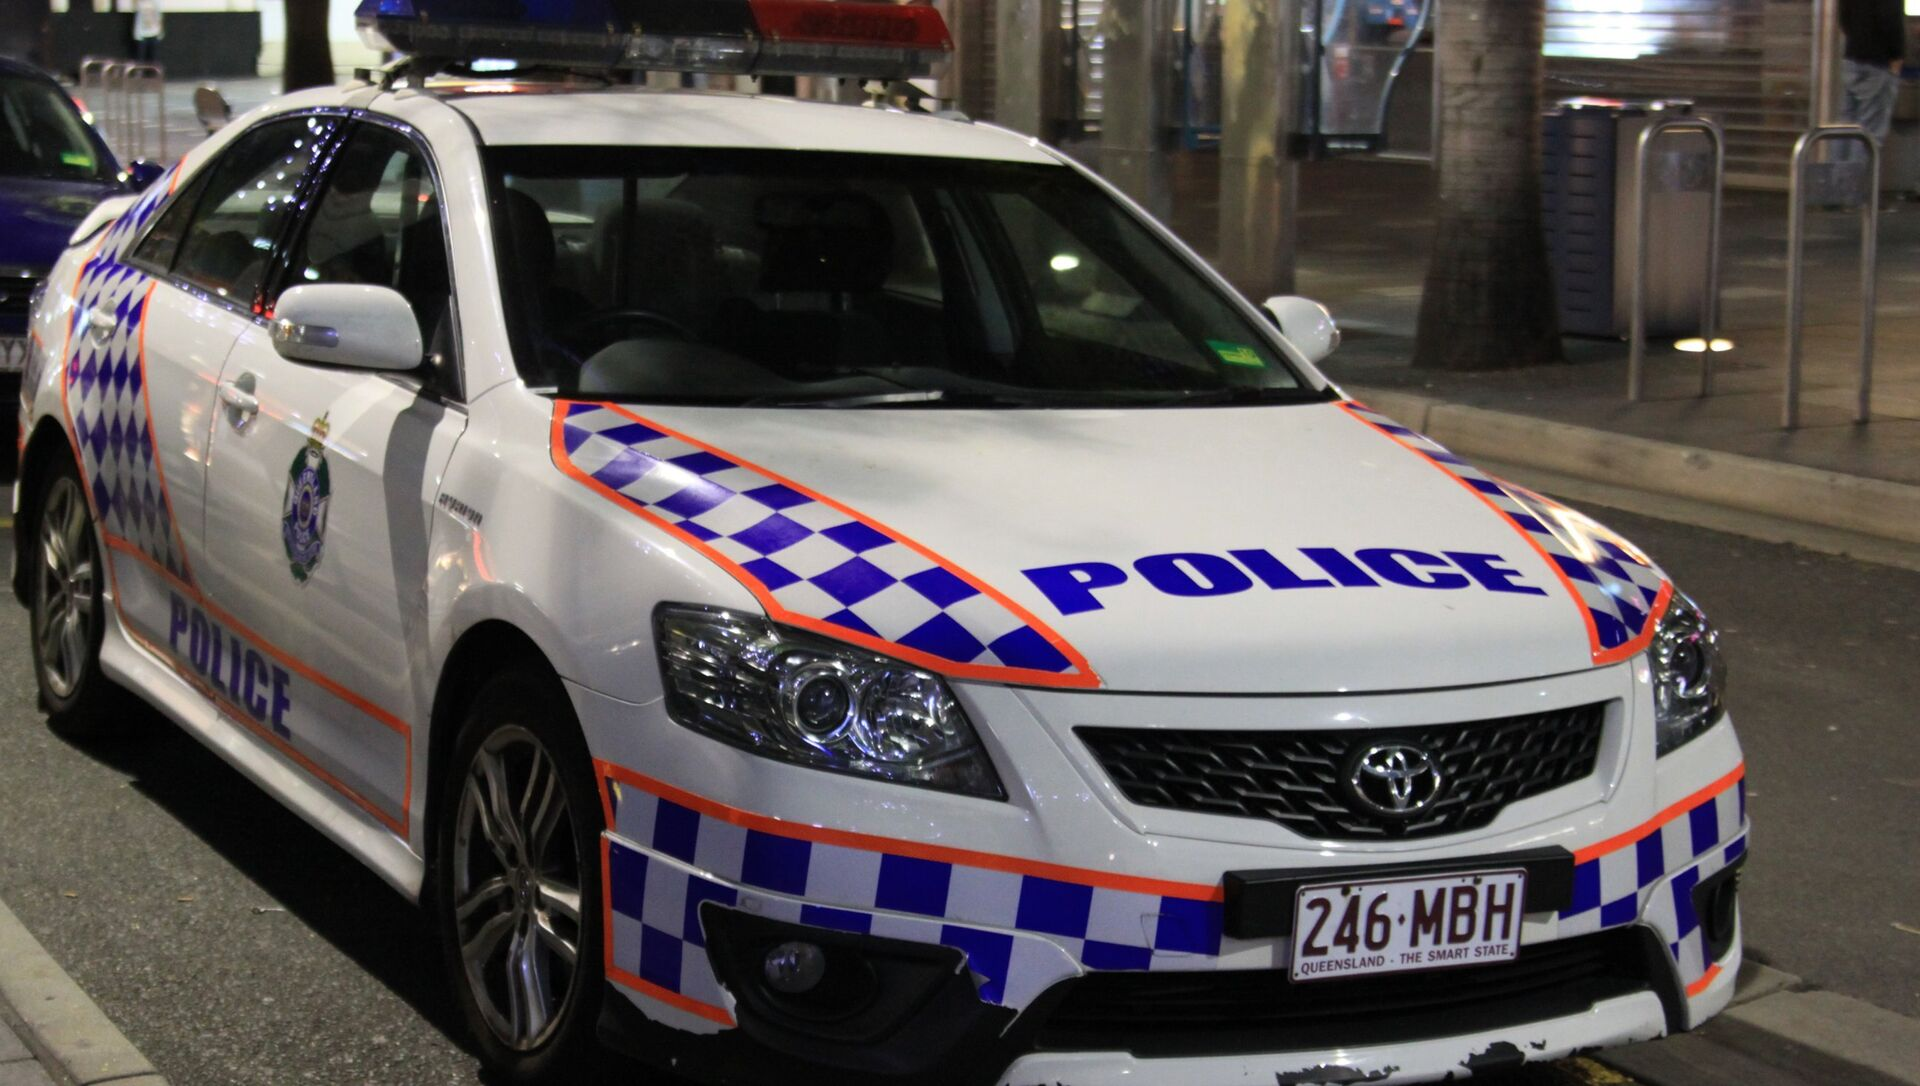 A police car in Gold Coast, Queensland, Australia - Sputnik International, 1920, 02.08.2021